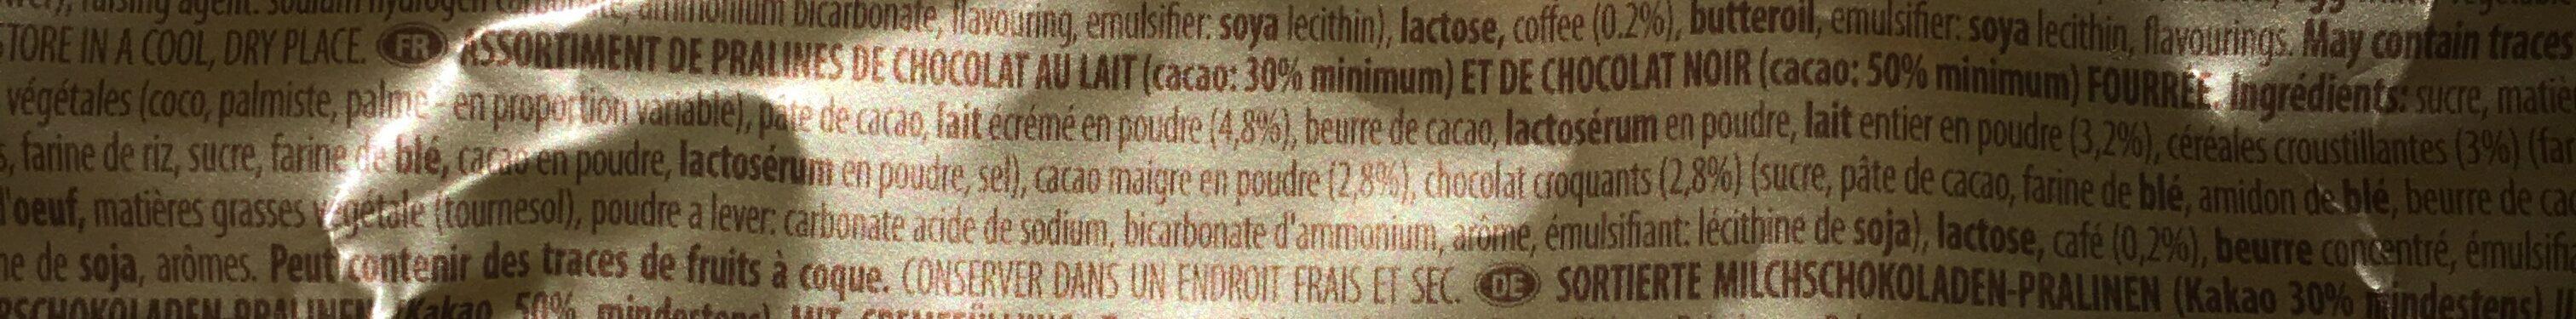 Speciality - Ingrediënten - fr